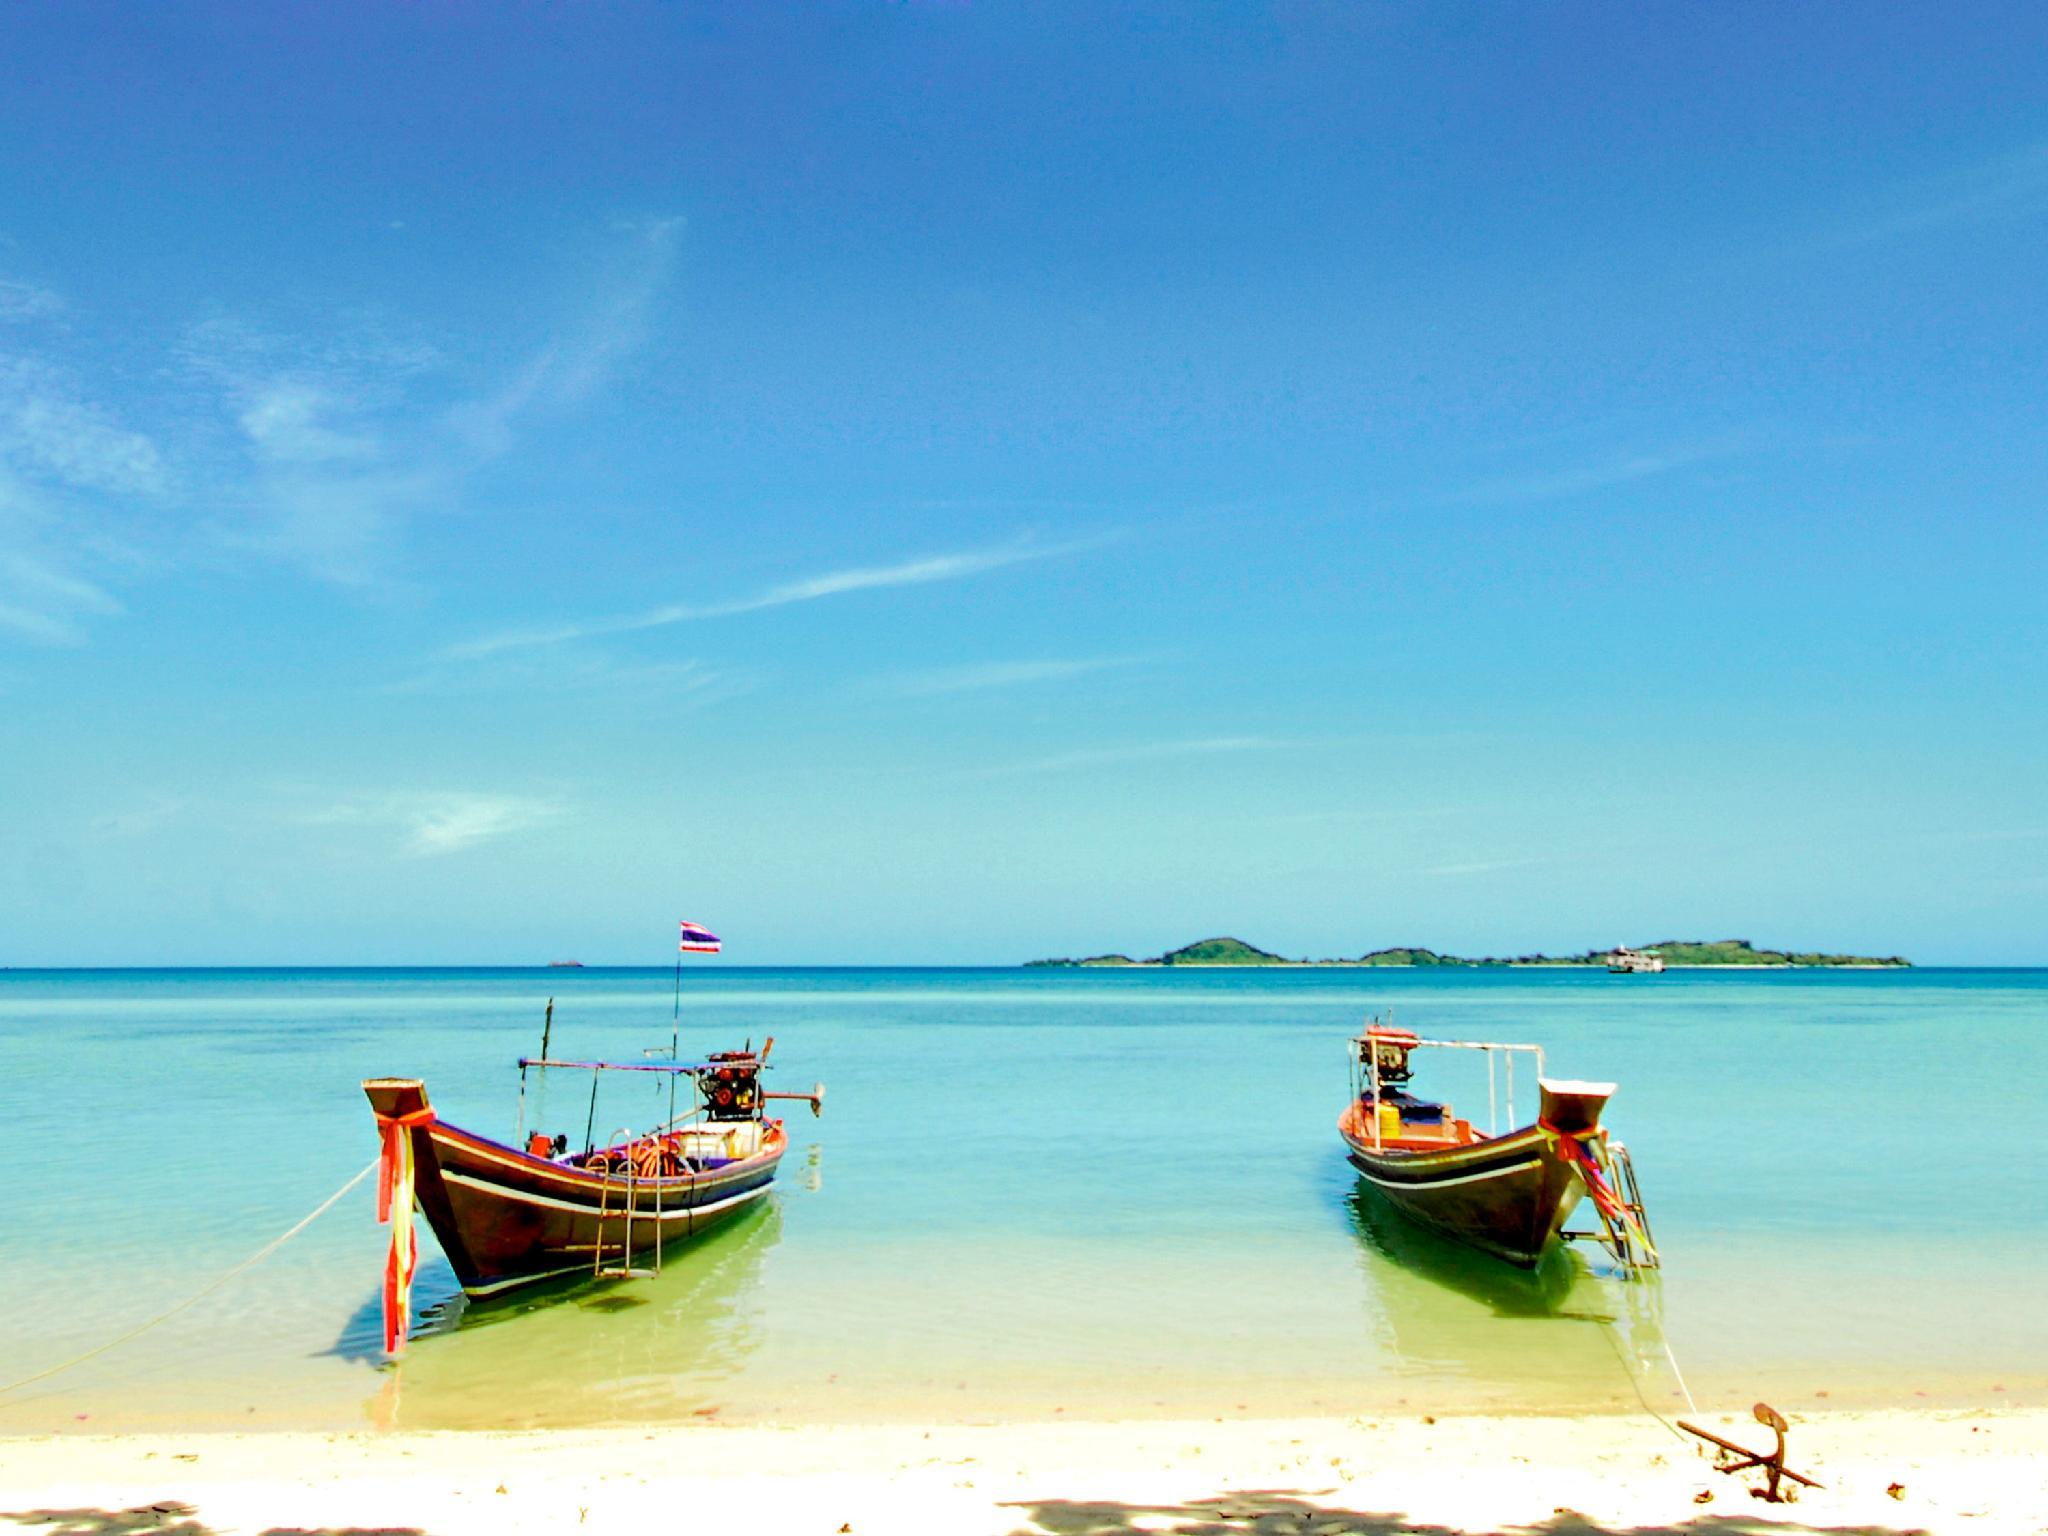 Ibis Styles Koh Samui Chaweng Beach